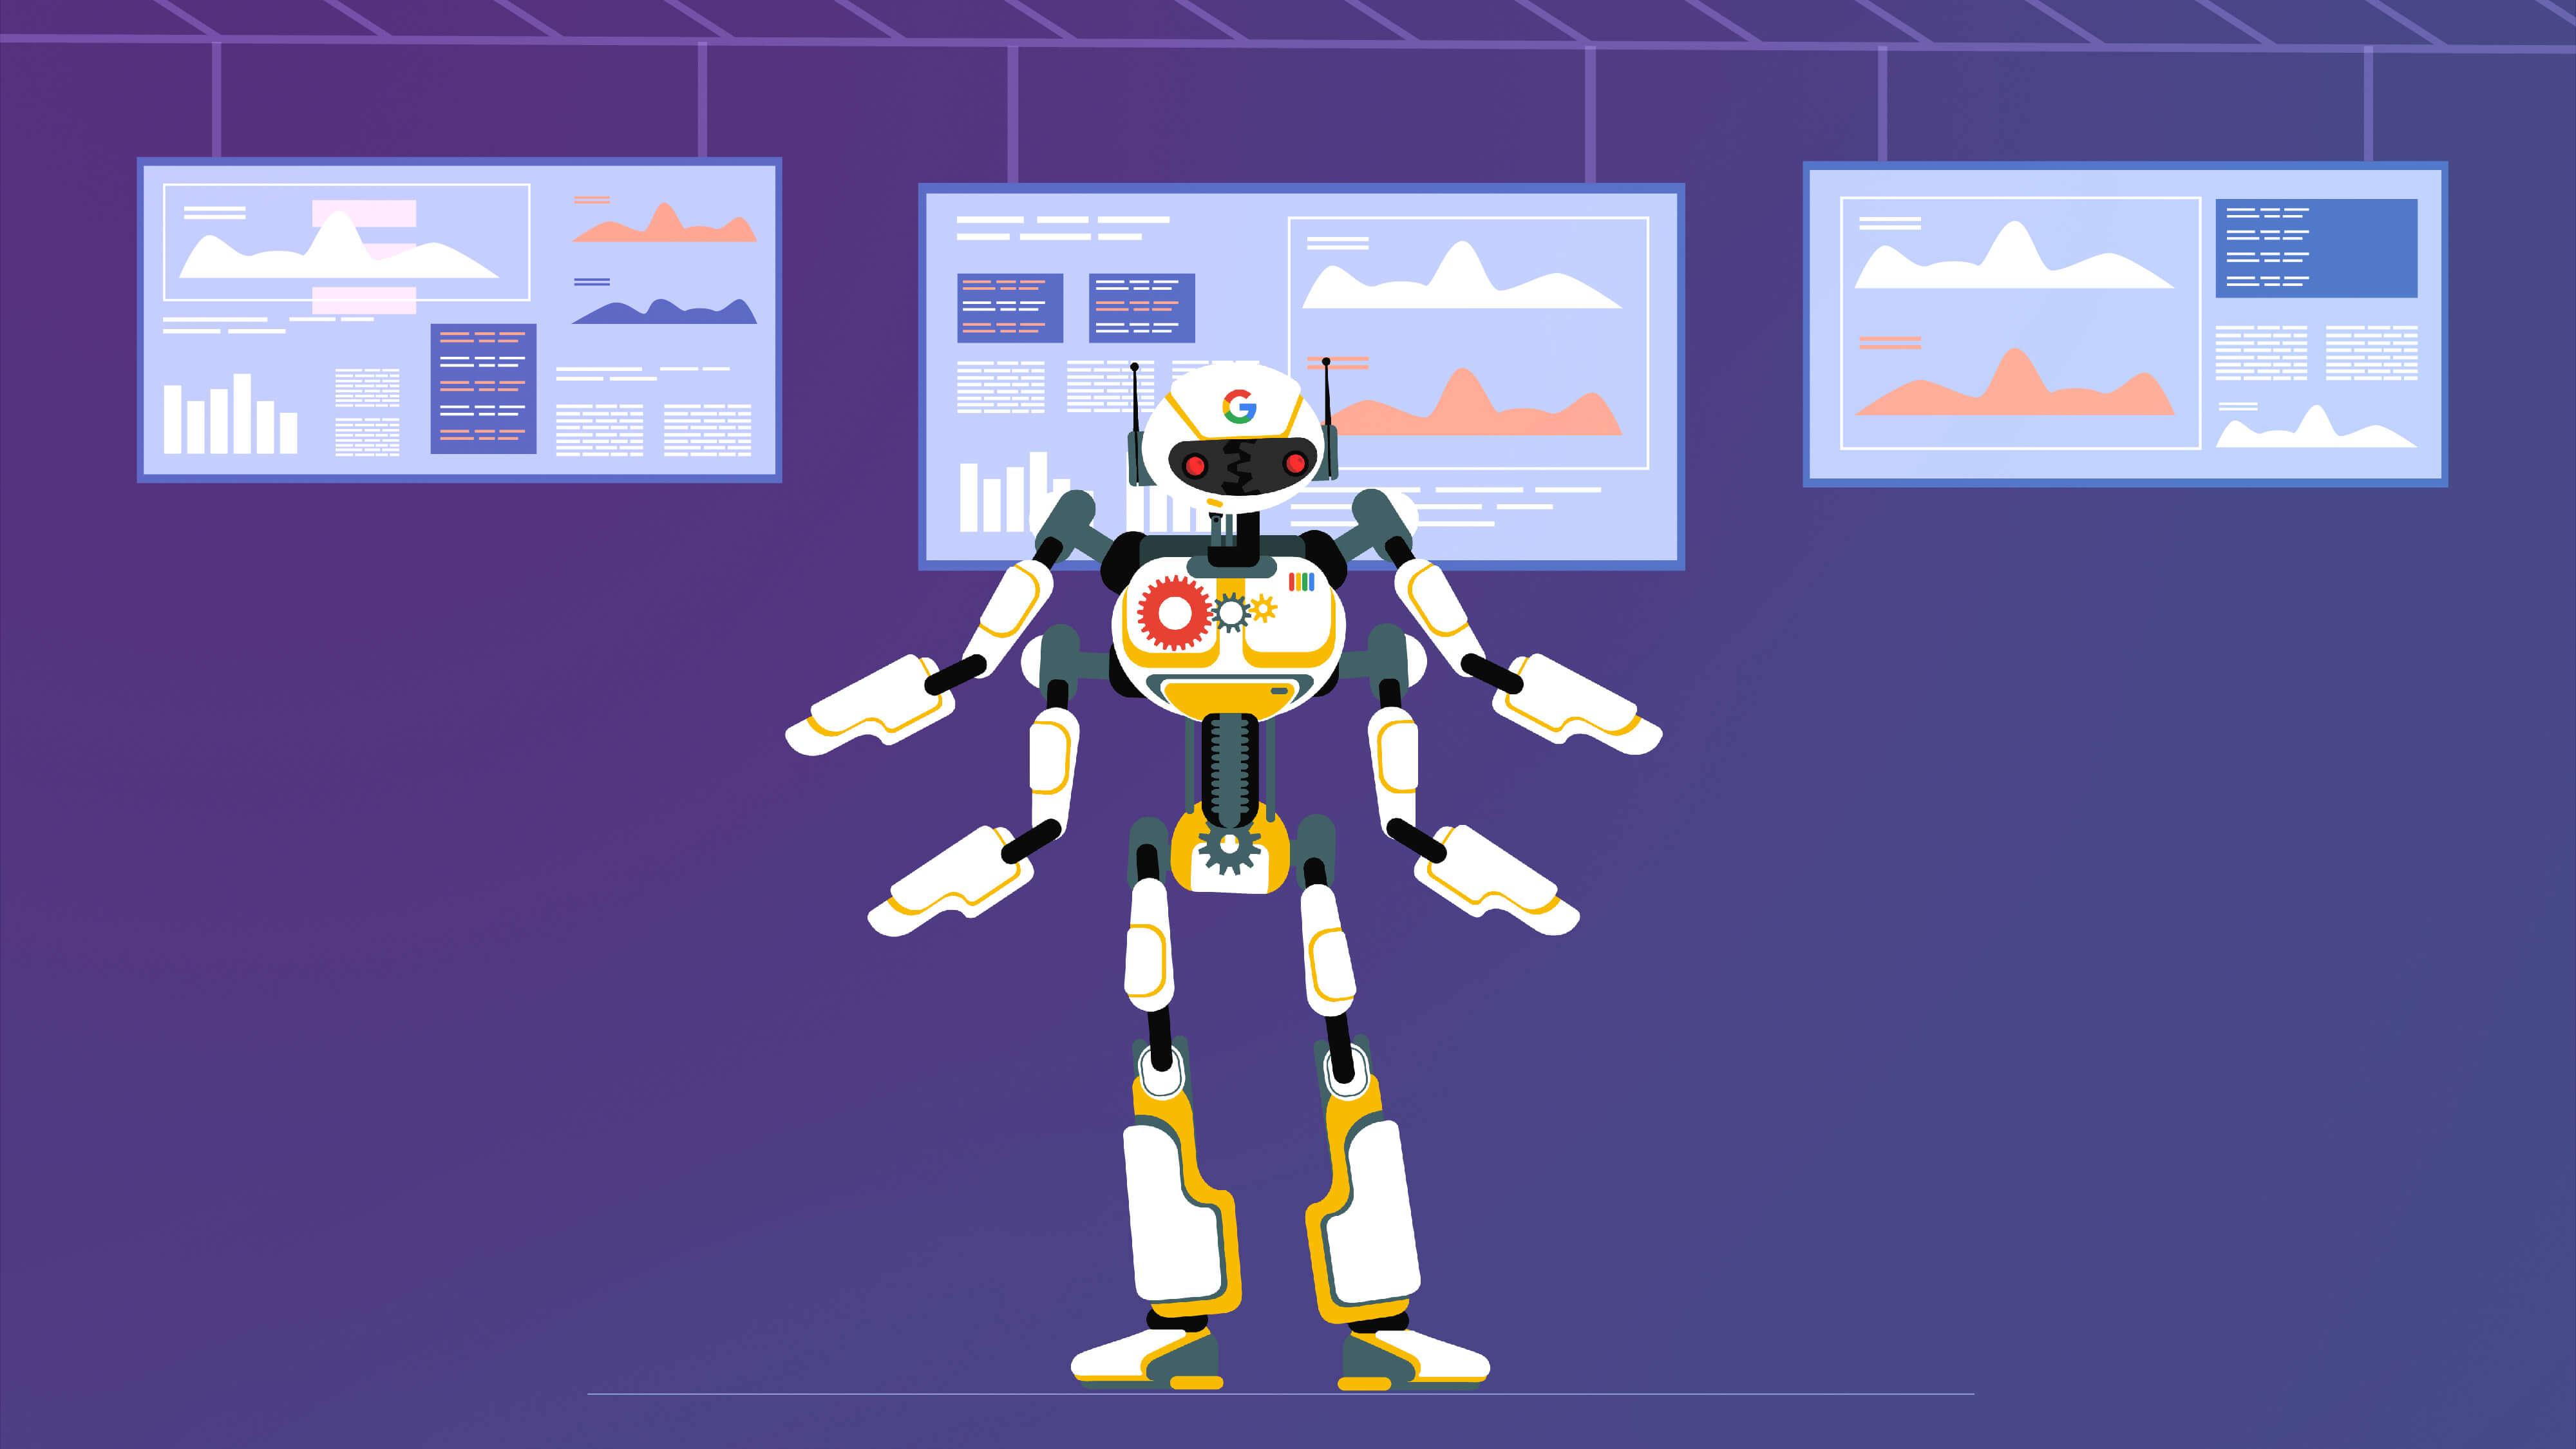 Google Machine and AI